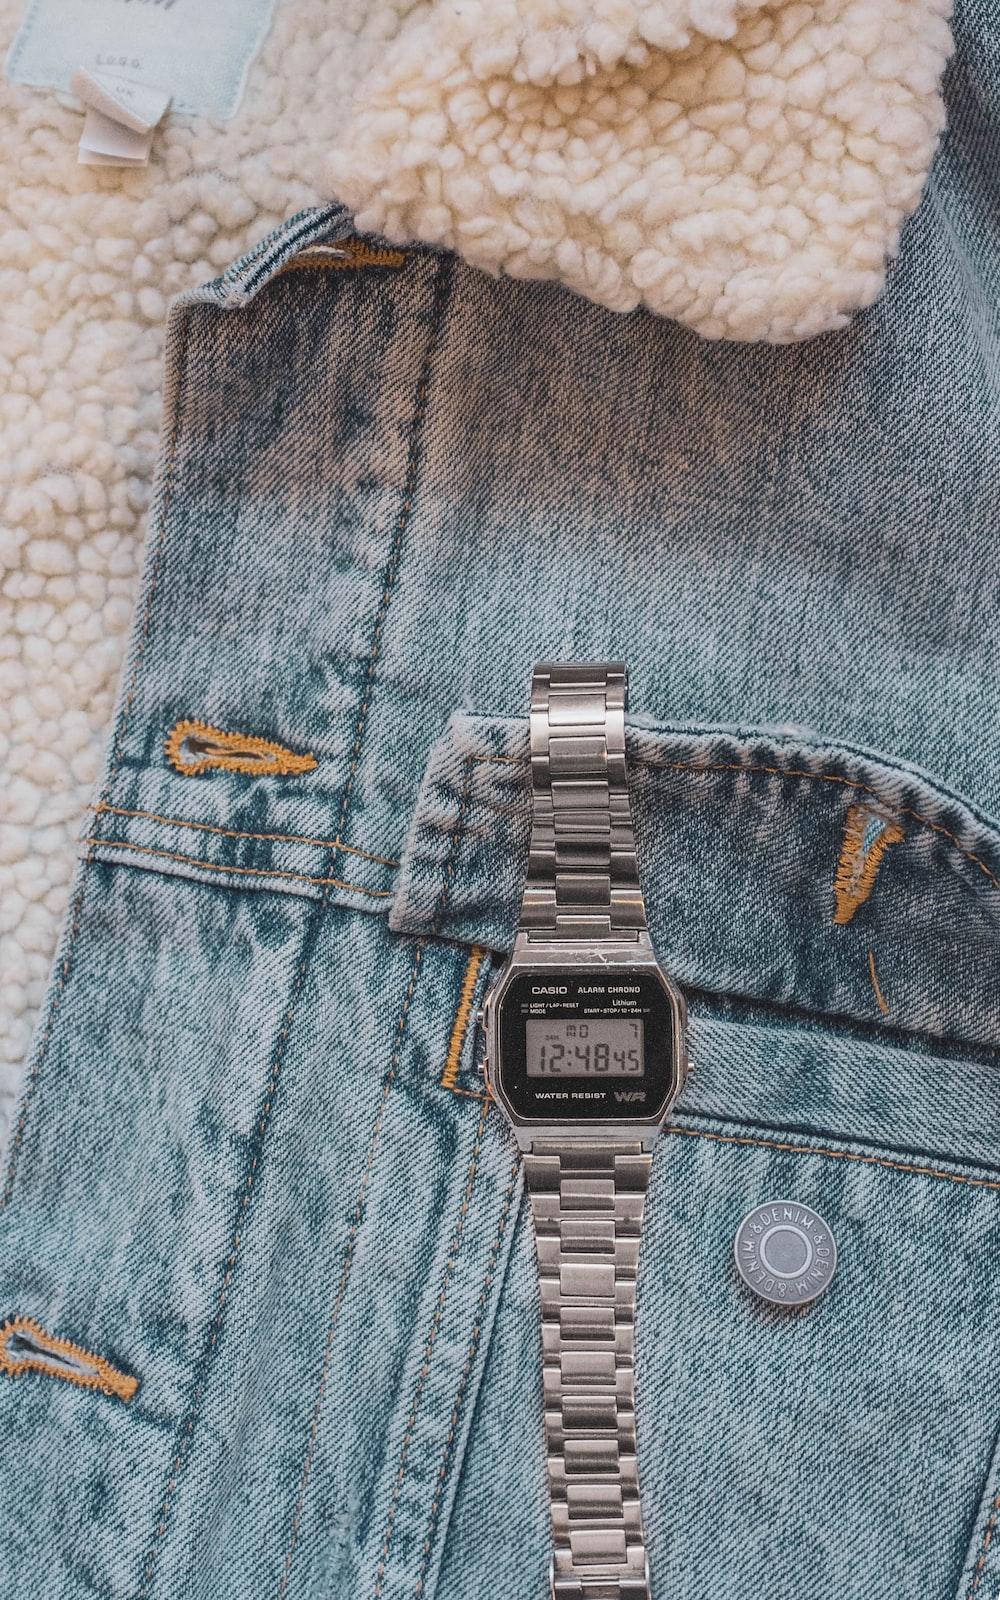 silver link bracelet square digital watch